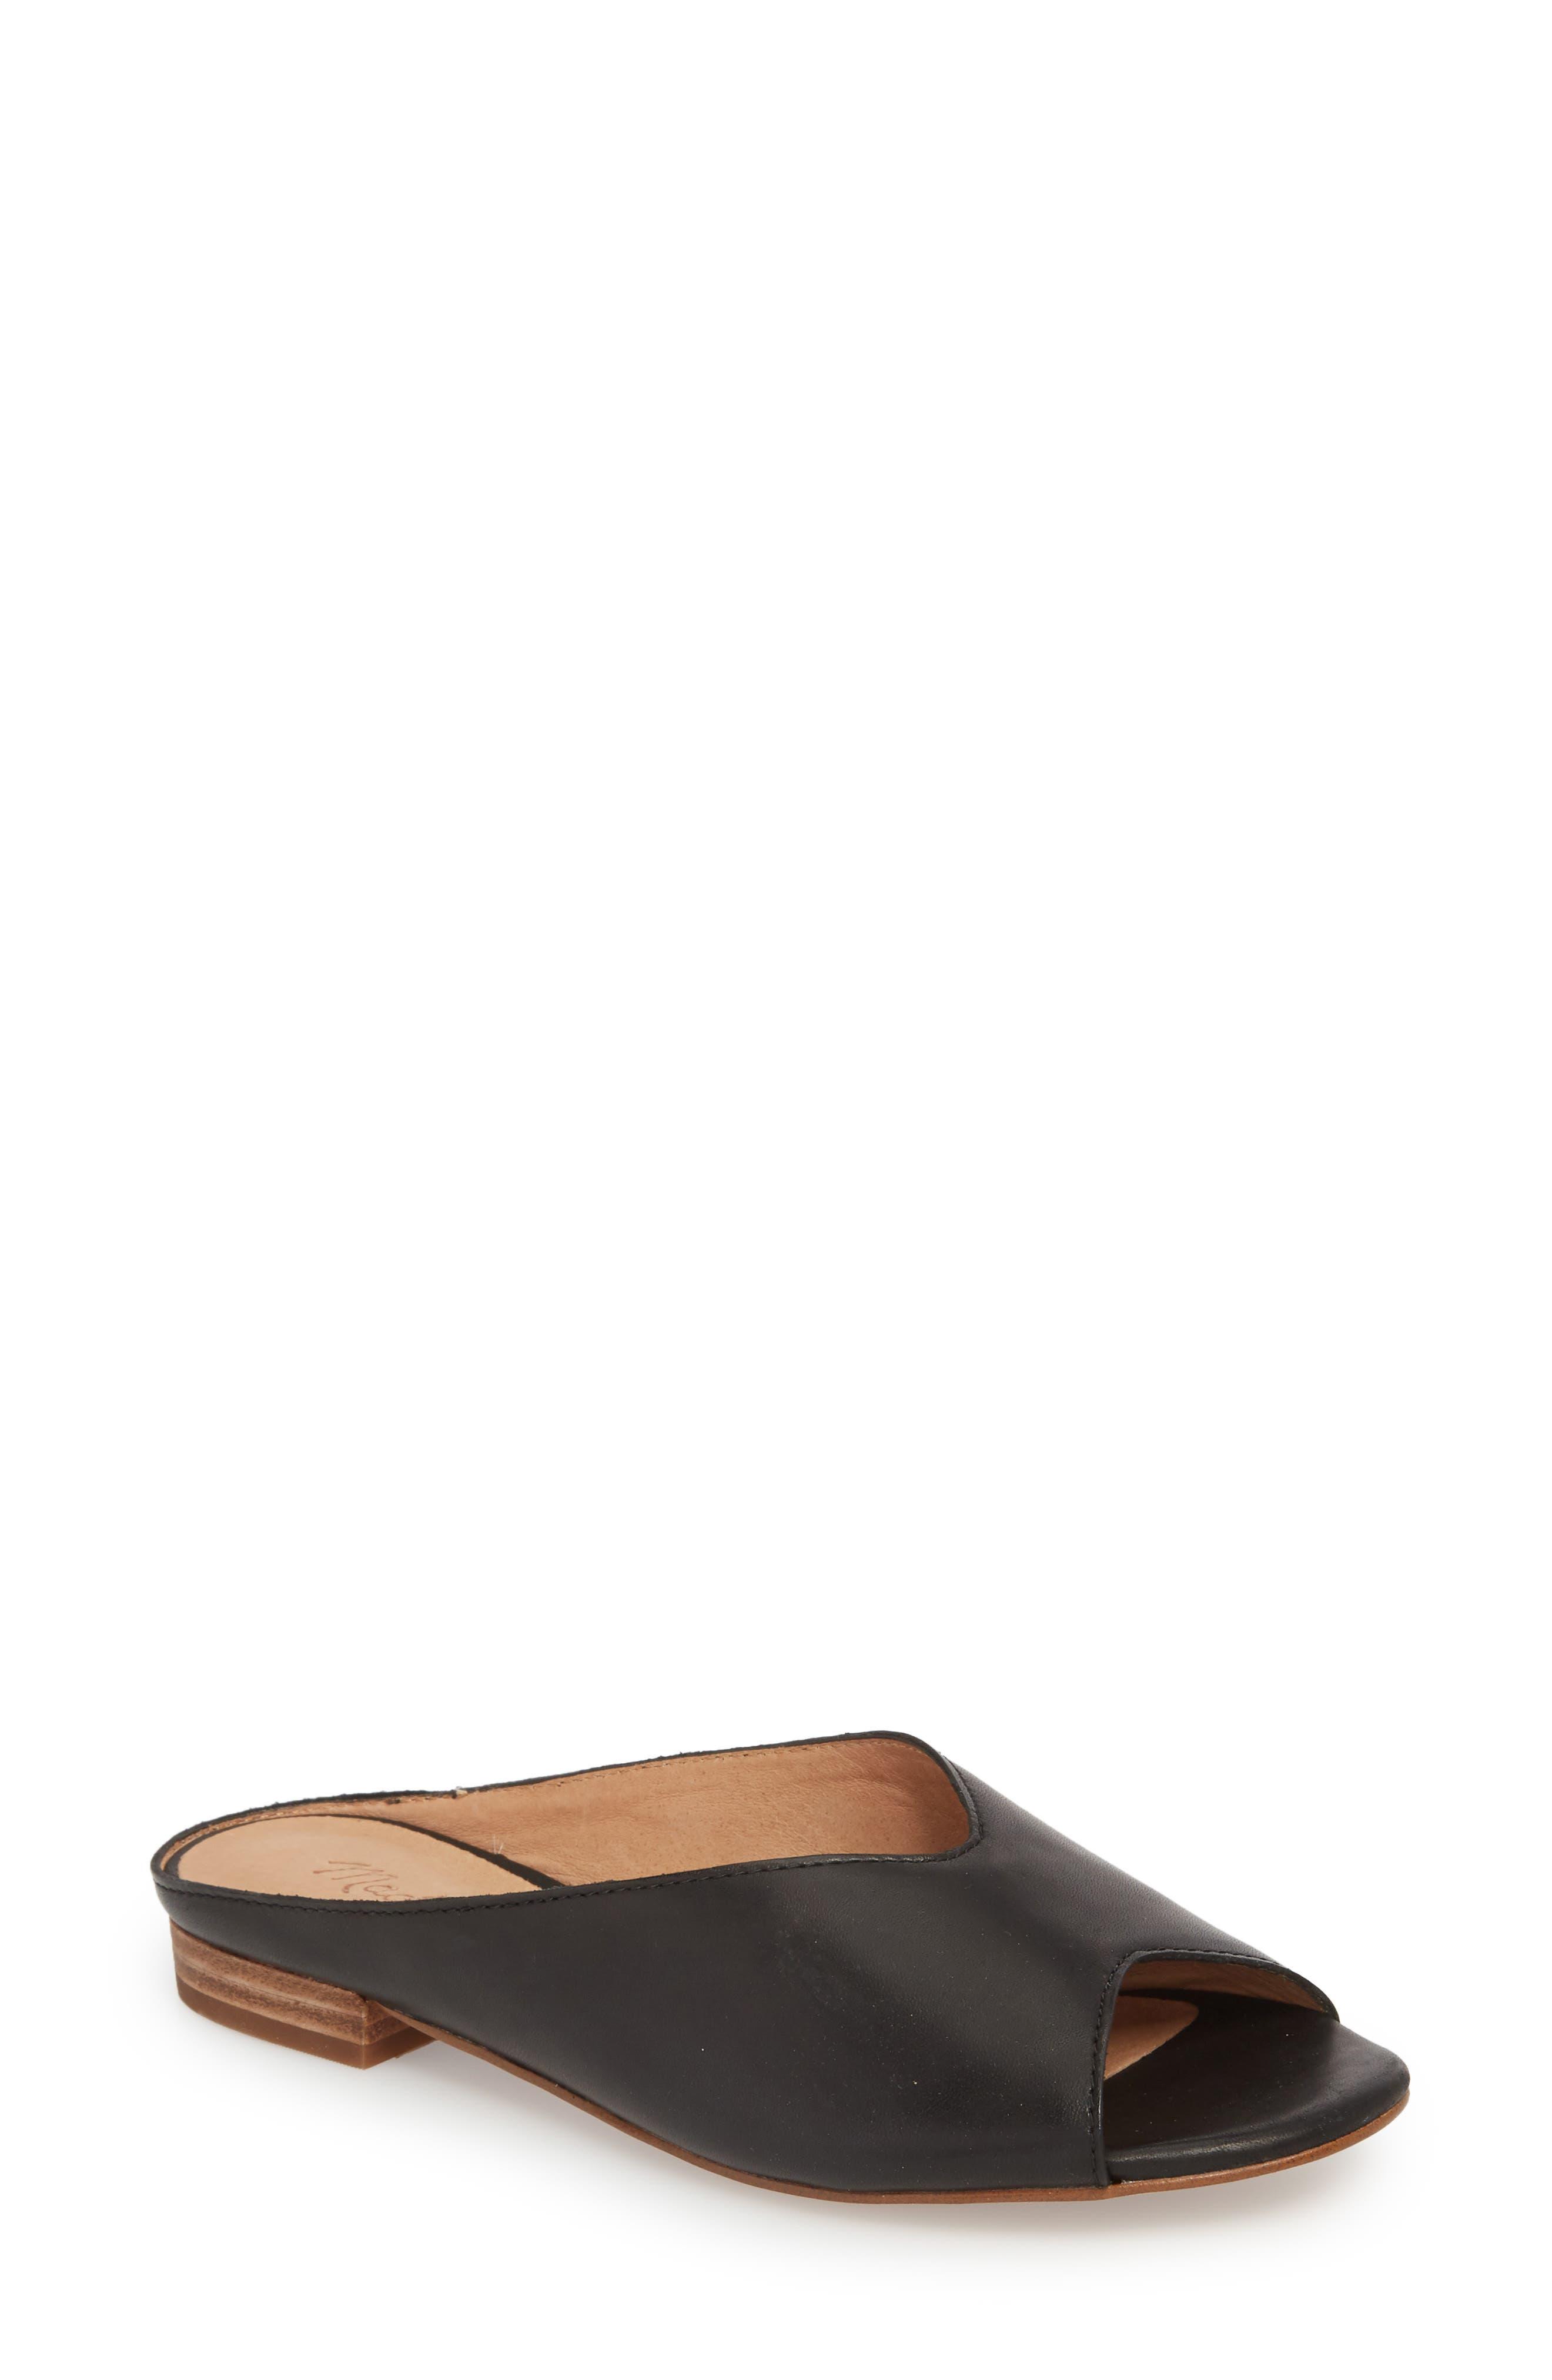 Tavi Slide Sandal,                         Main,                         color,